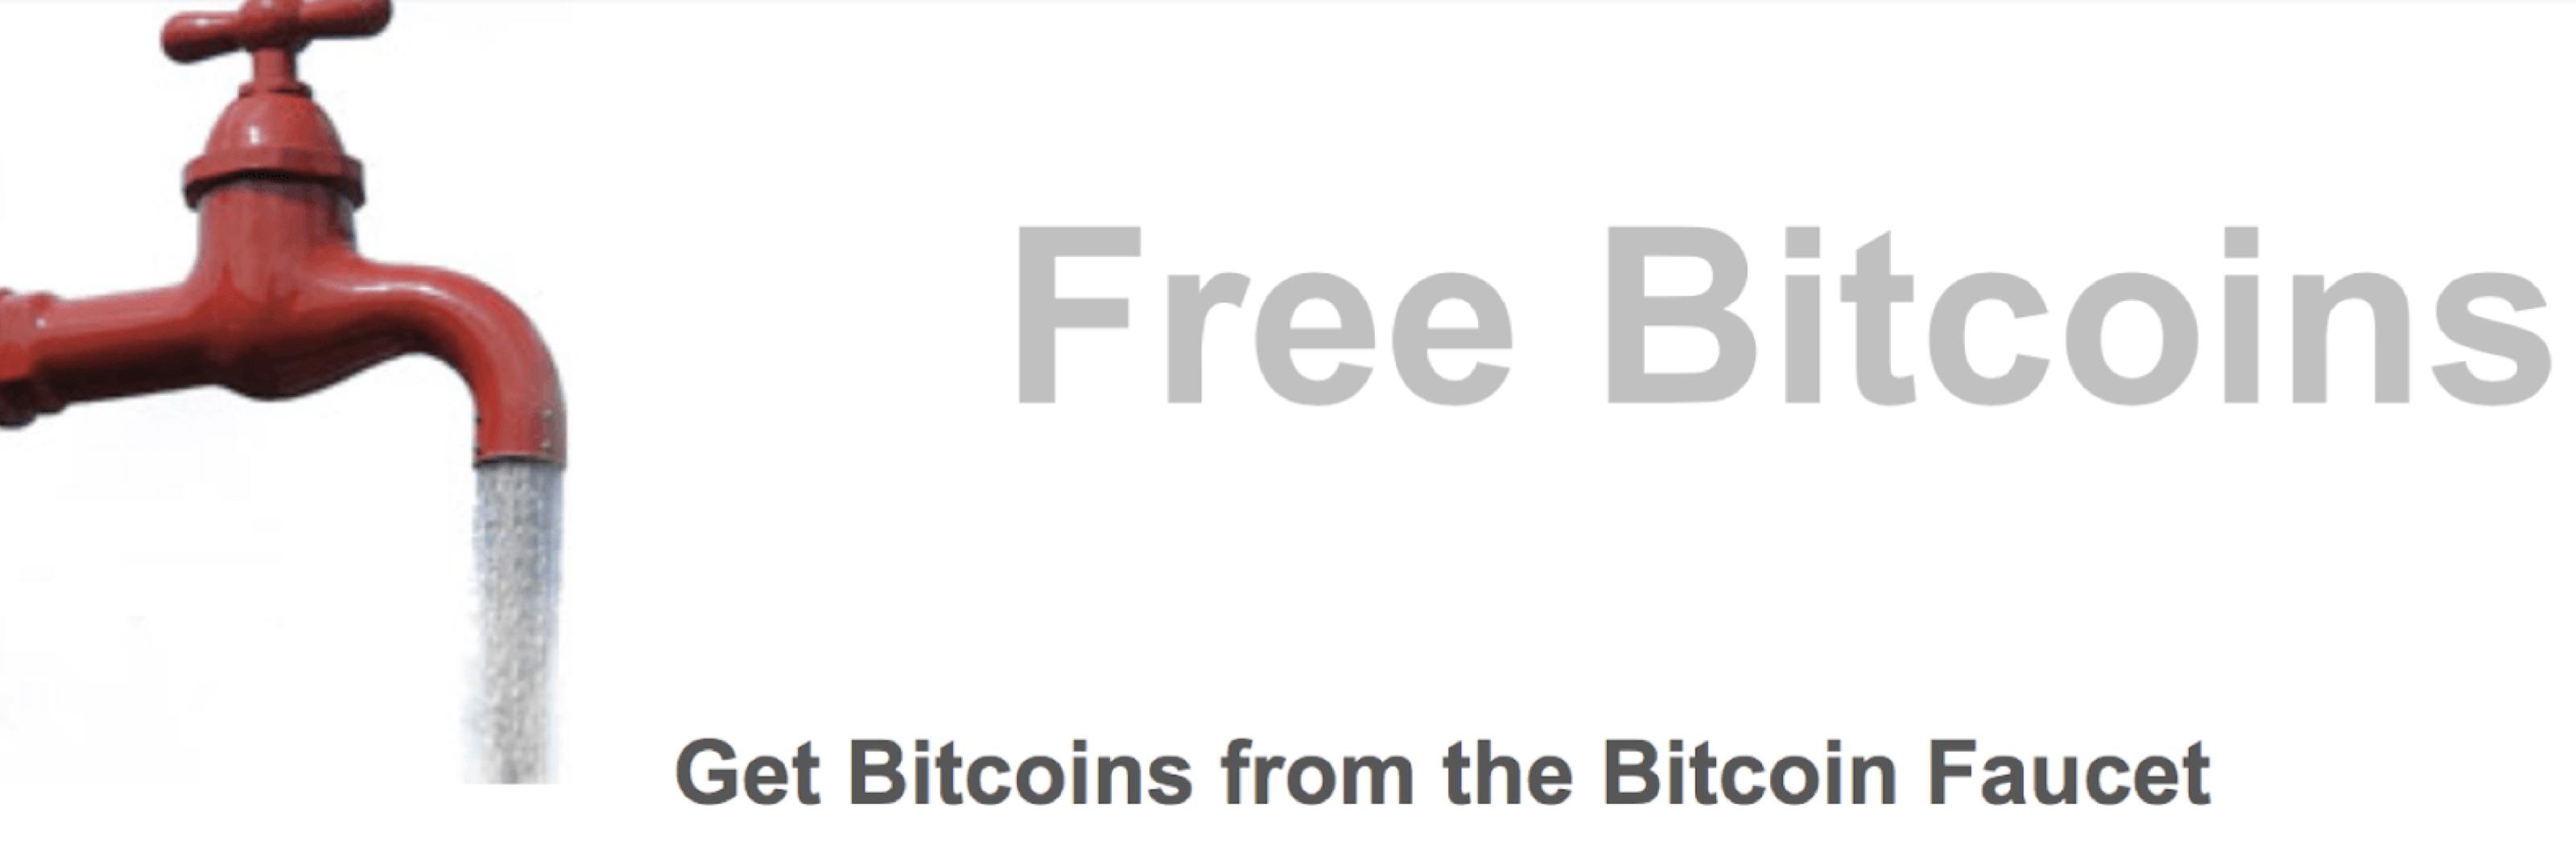 pénzt utalni a bitcoinokra)